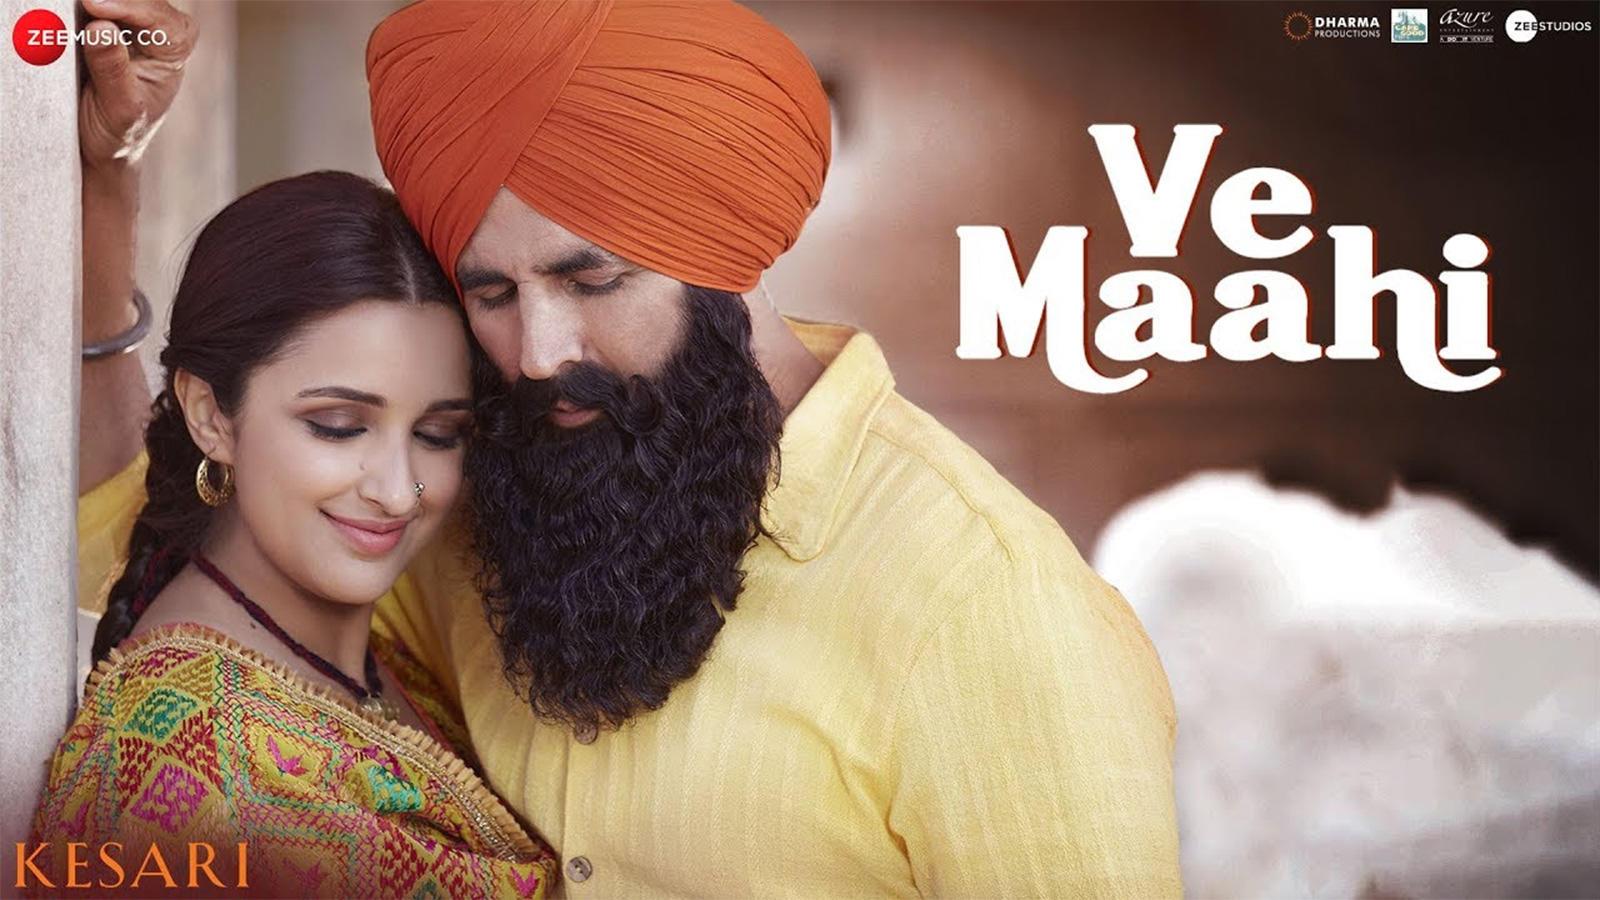 Kesari   Song - Ve Maahi   Hindi Video Songs - Times of India